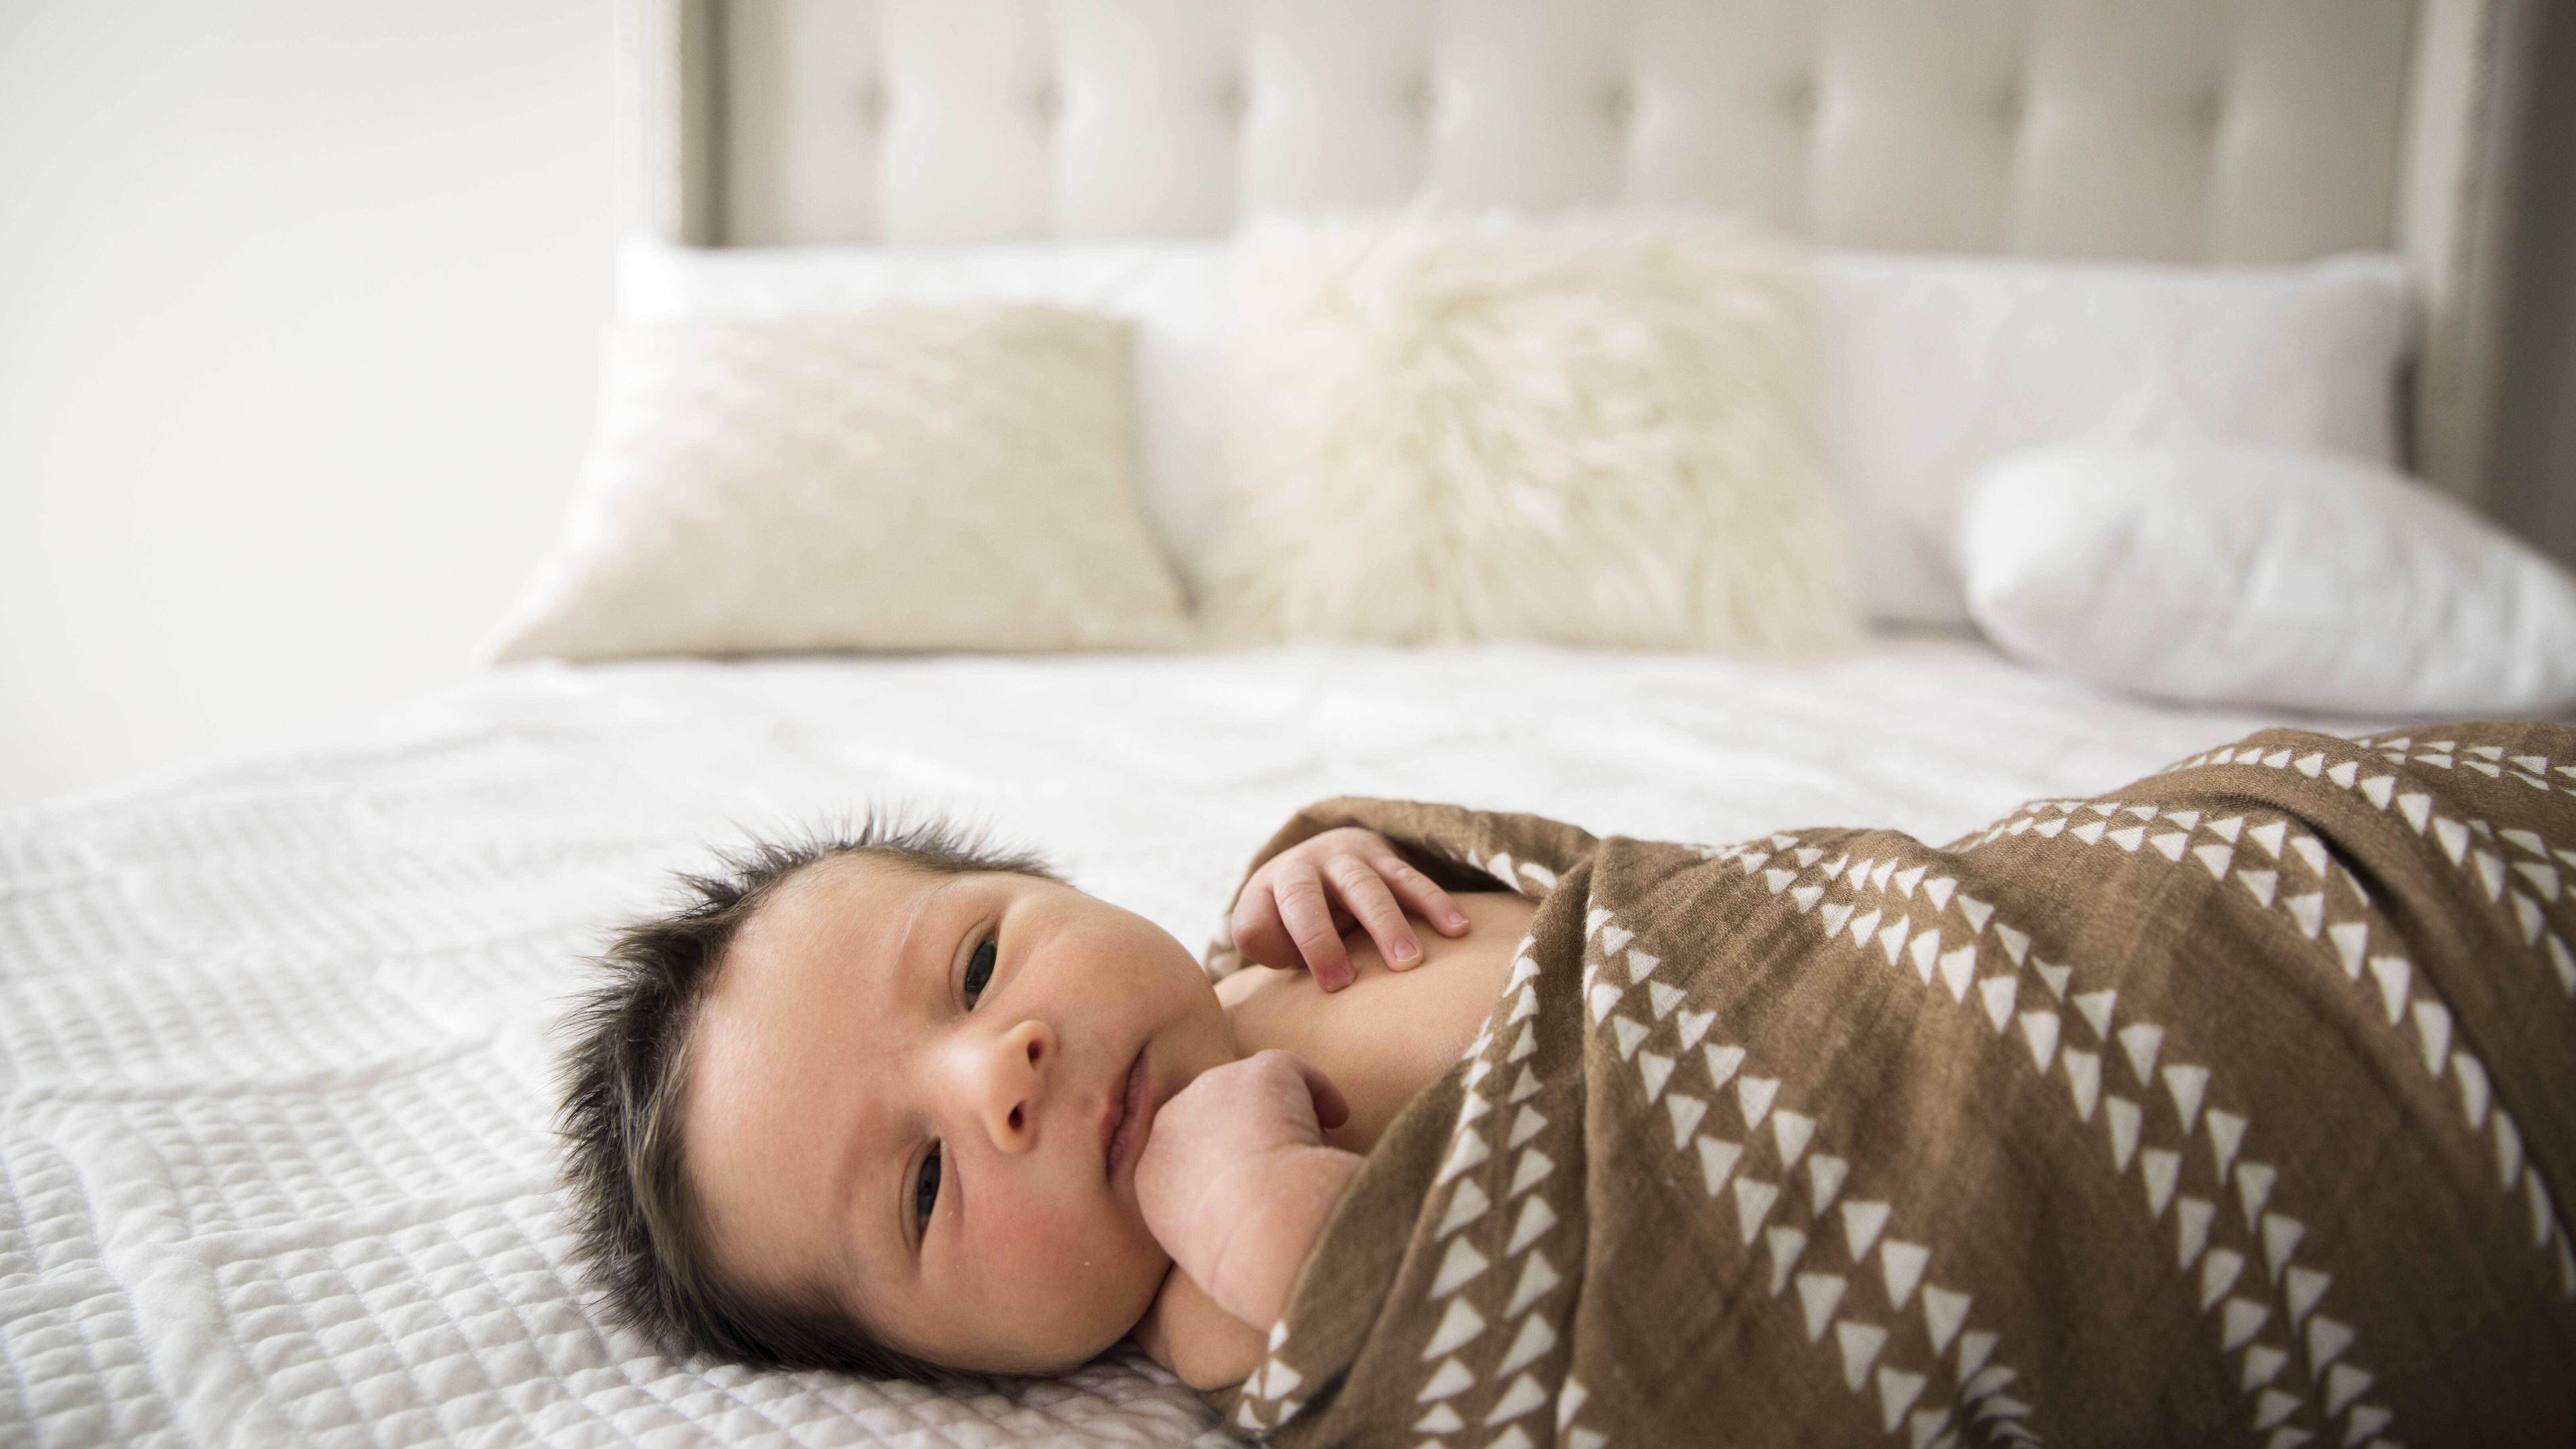 Haarausfall bei Babys ist meist harmlos